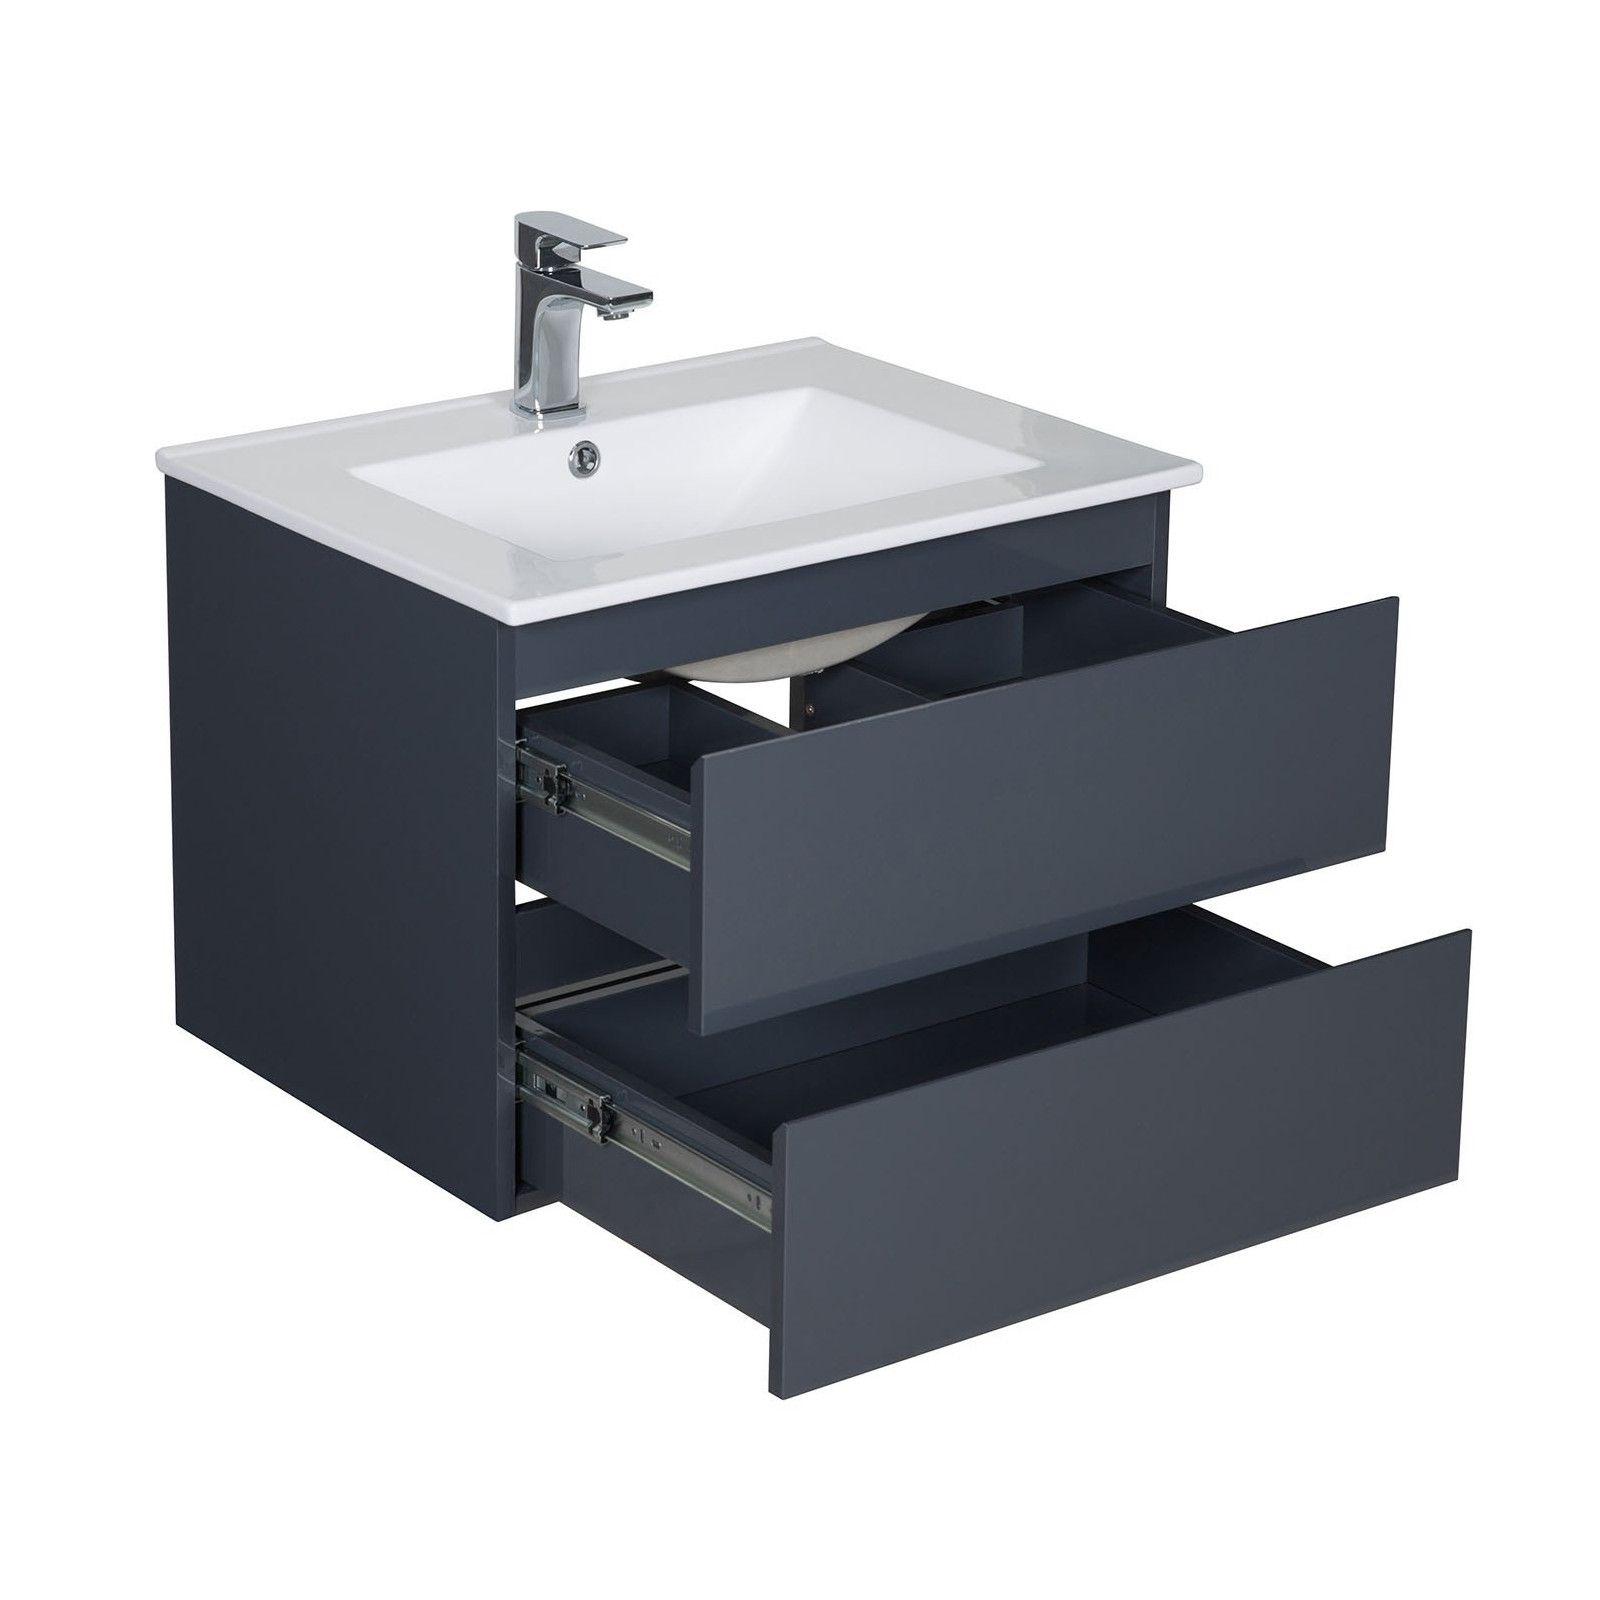 meuble salle de bain 60 cm suspendu gris anthracite sorrento